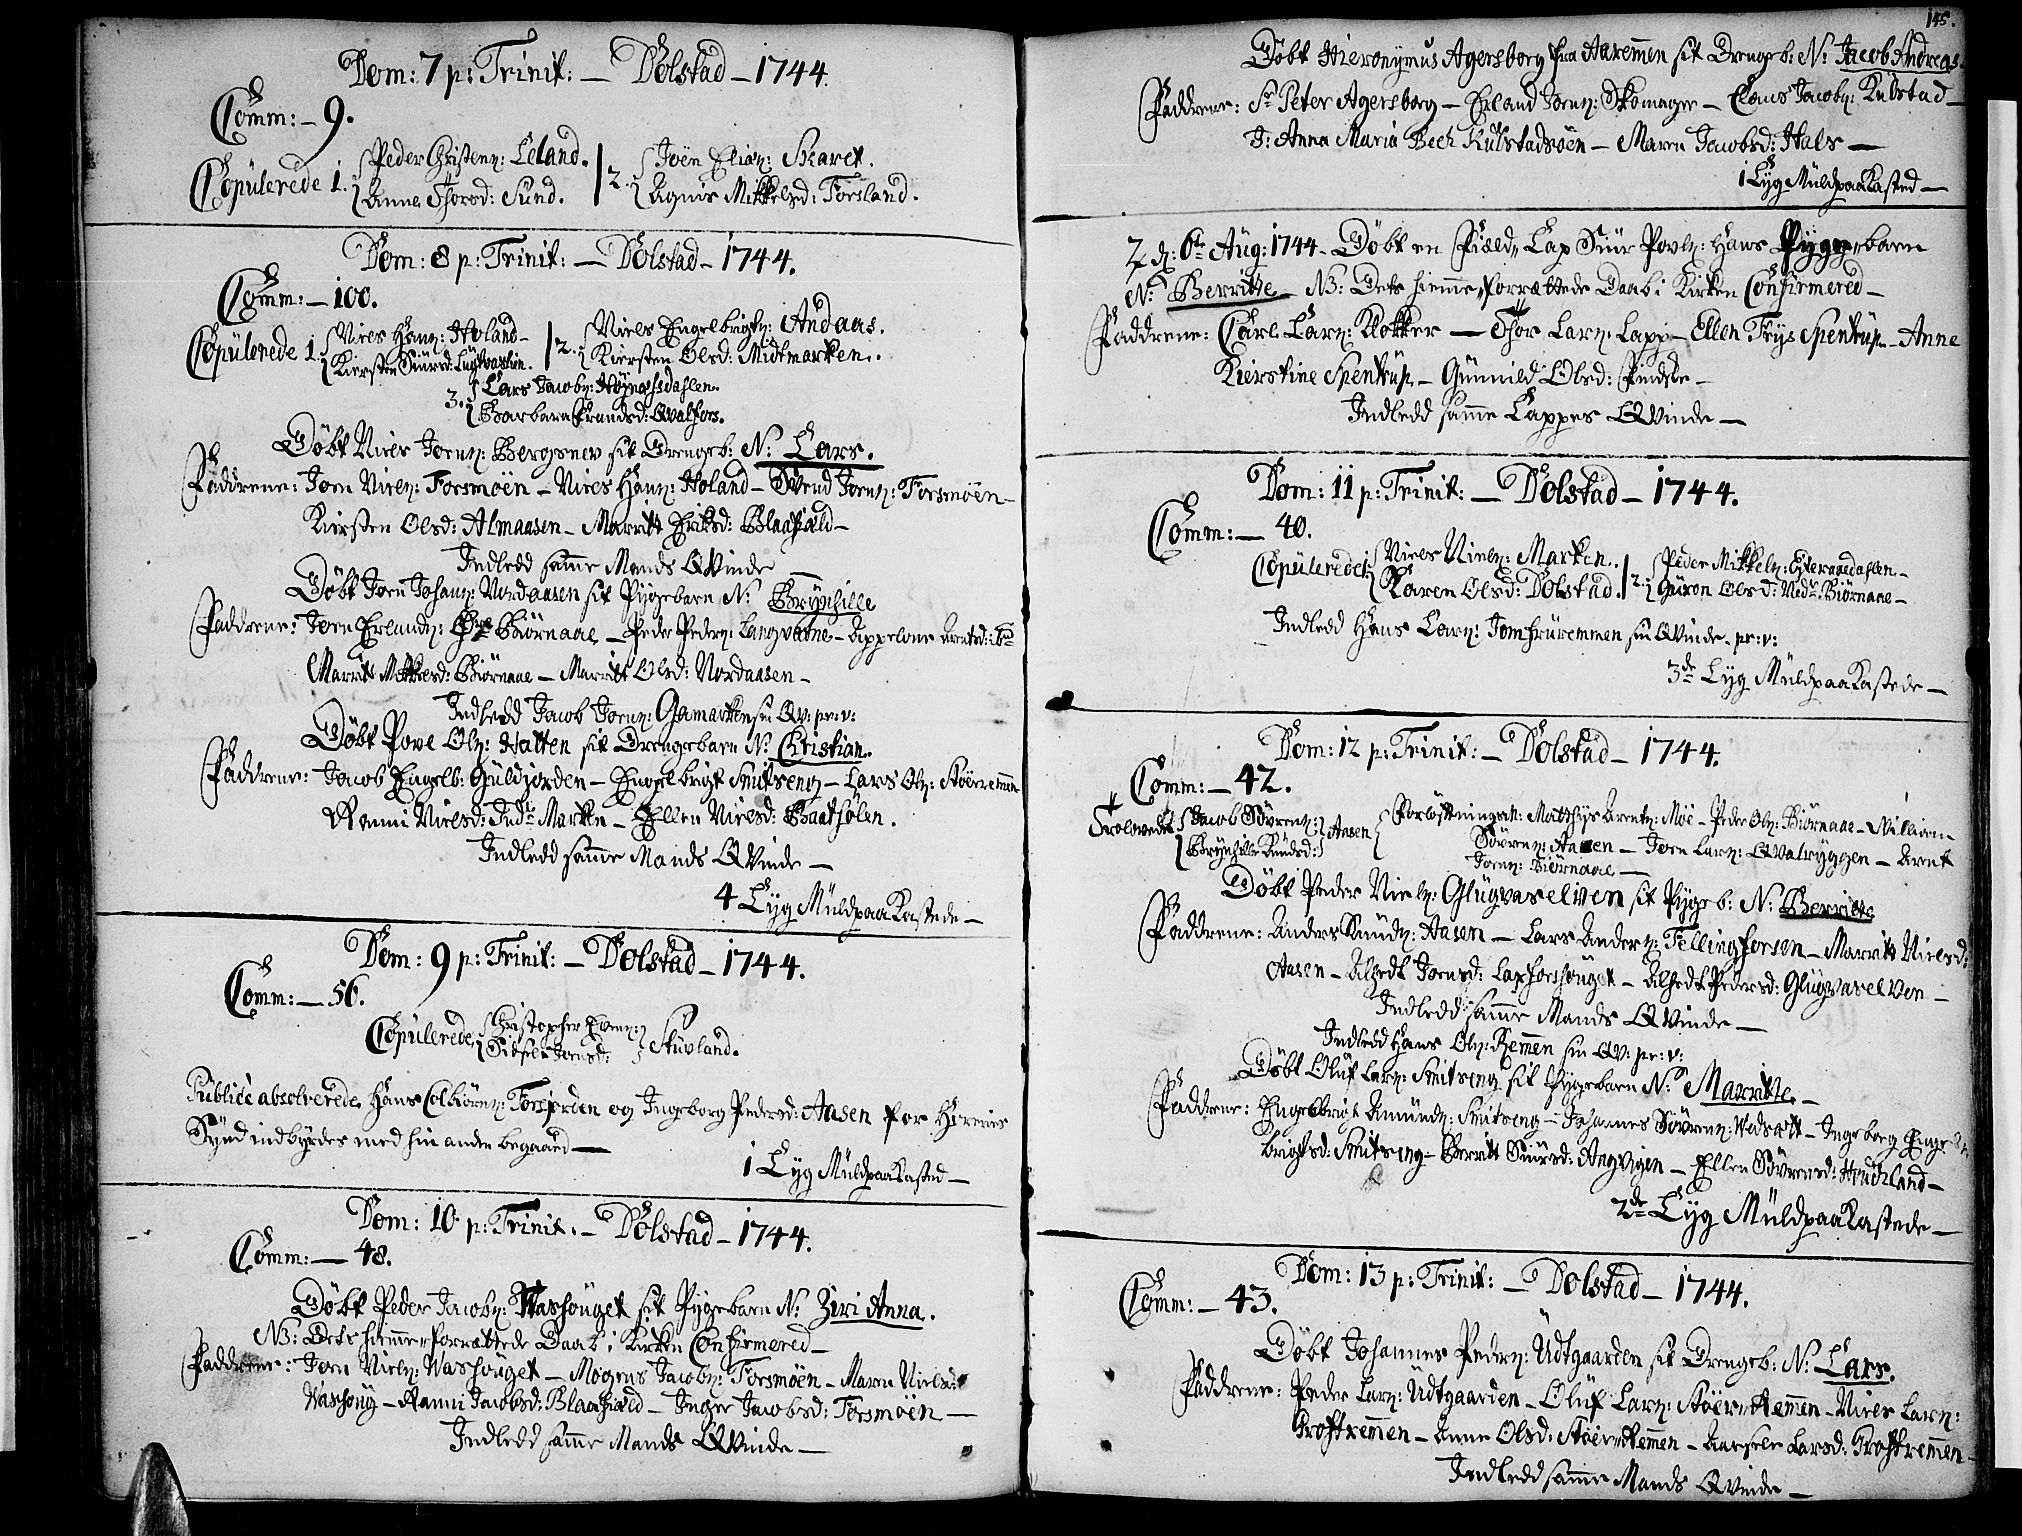 SAT, Ministerialprotokoller, klokkerbøker og fødselsregistre - Nordland, 820/L0284: Ministerialbok nr. 820A05, 1730-1752, s. 145